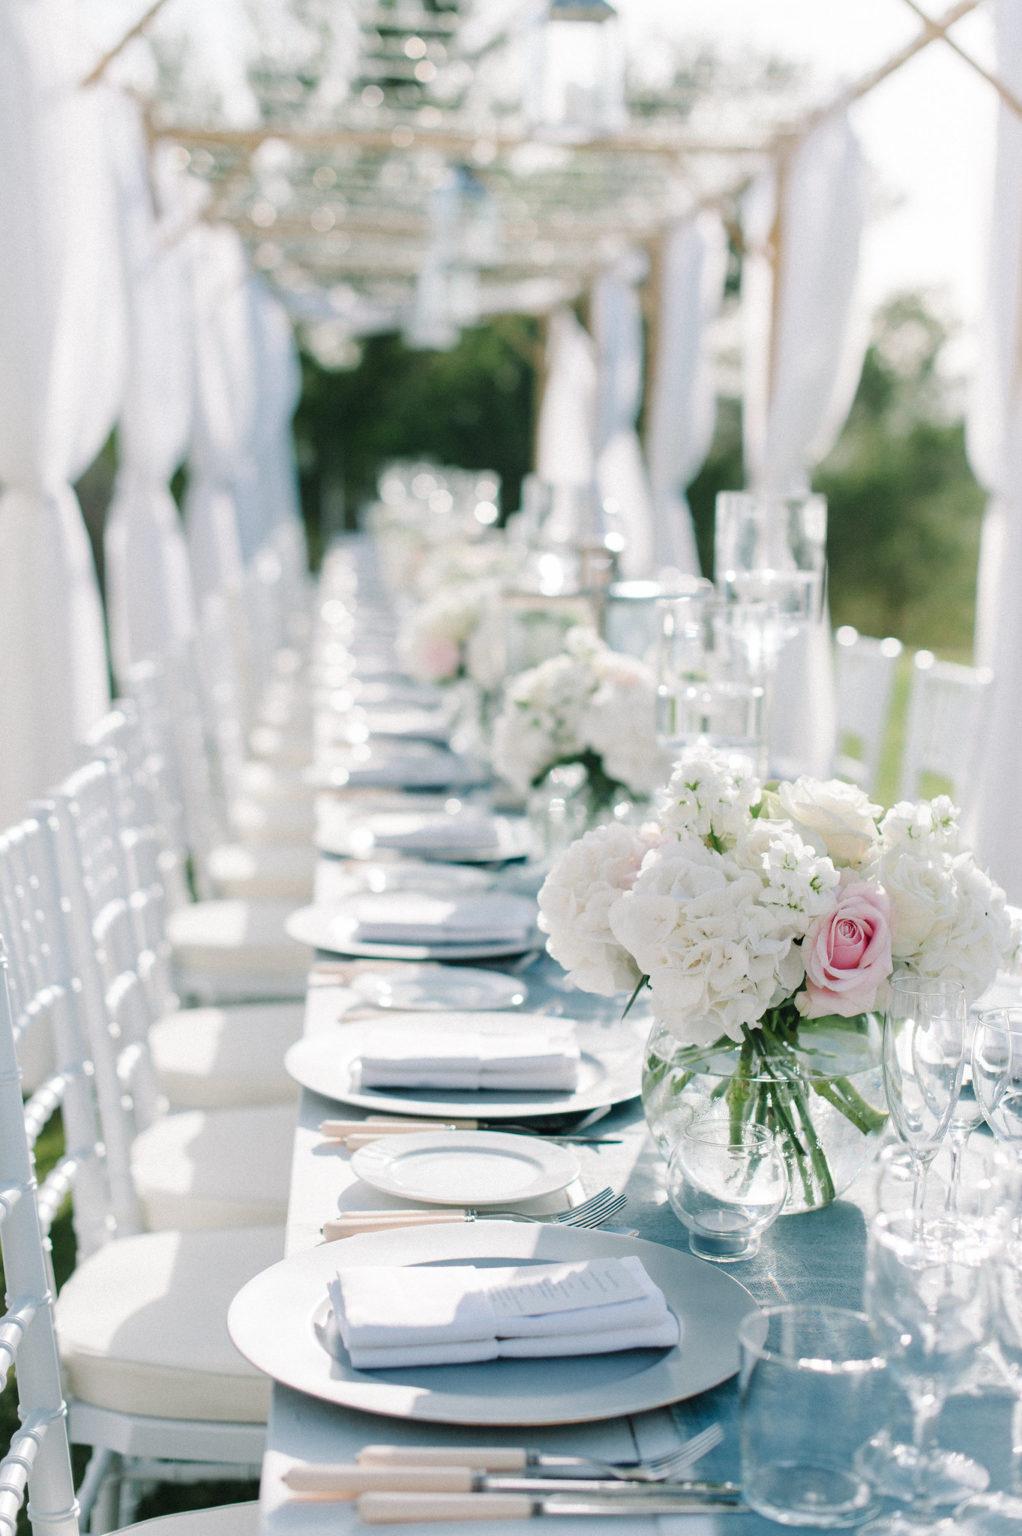 https://www.white-ibiza.com/wp-content/uploads/2020/03/white-ibiza-weddings-velvet-circus-ibiza-2020-04-1022x1536.jpg